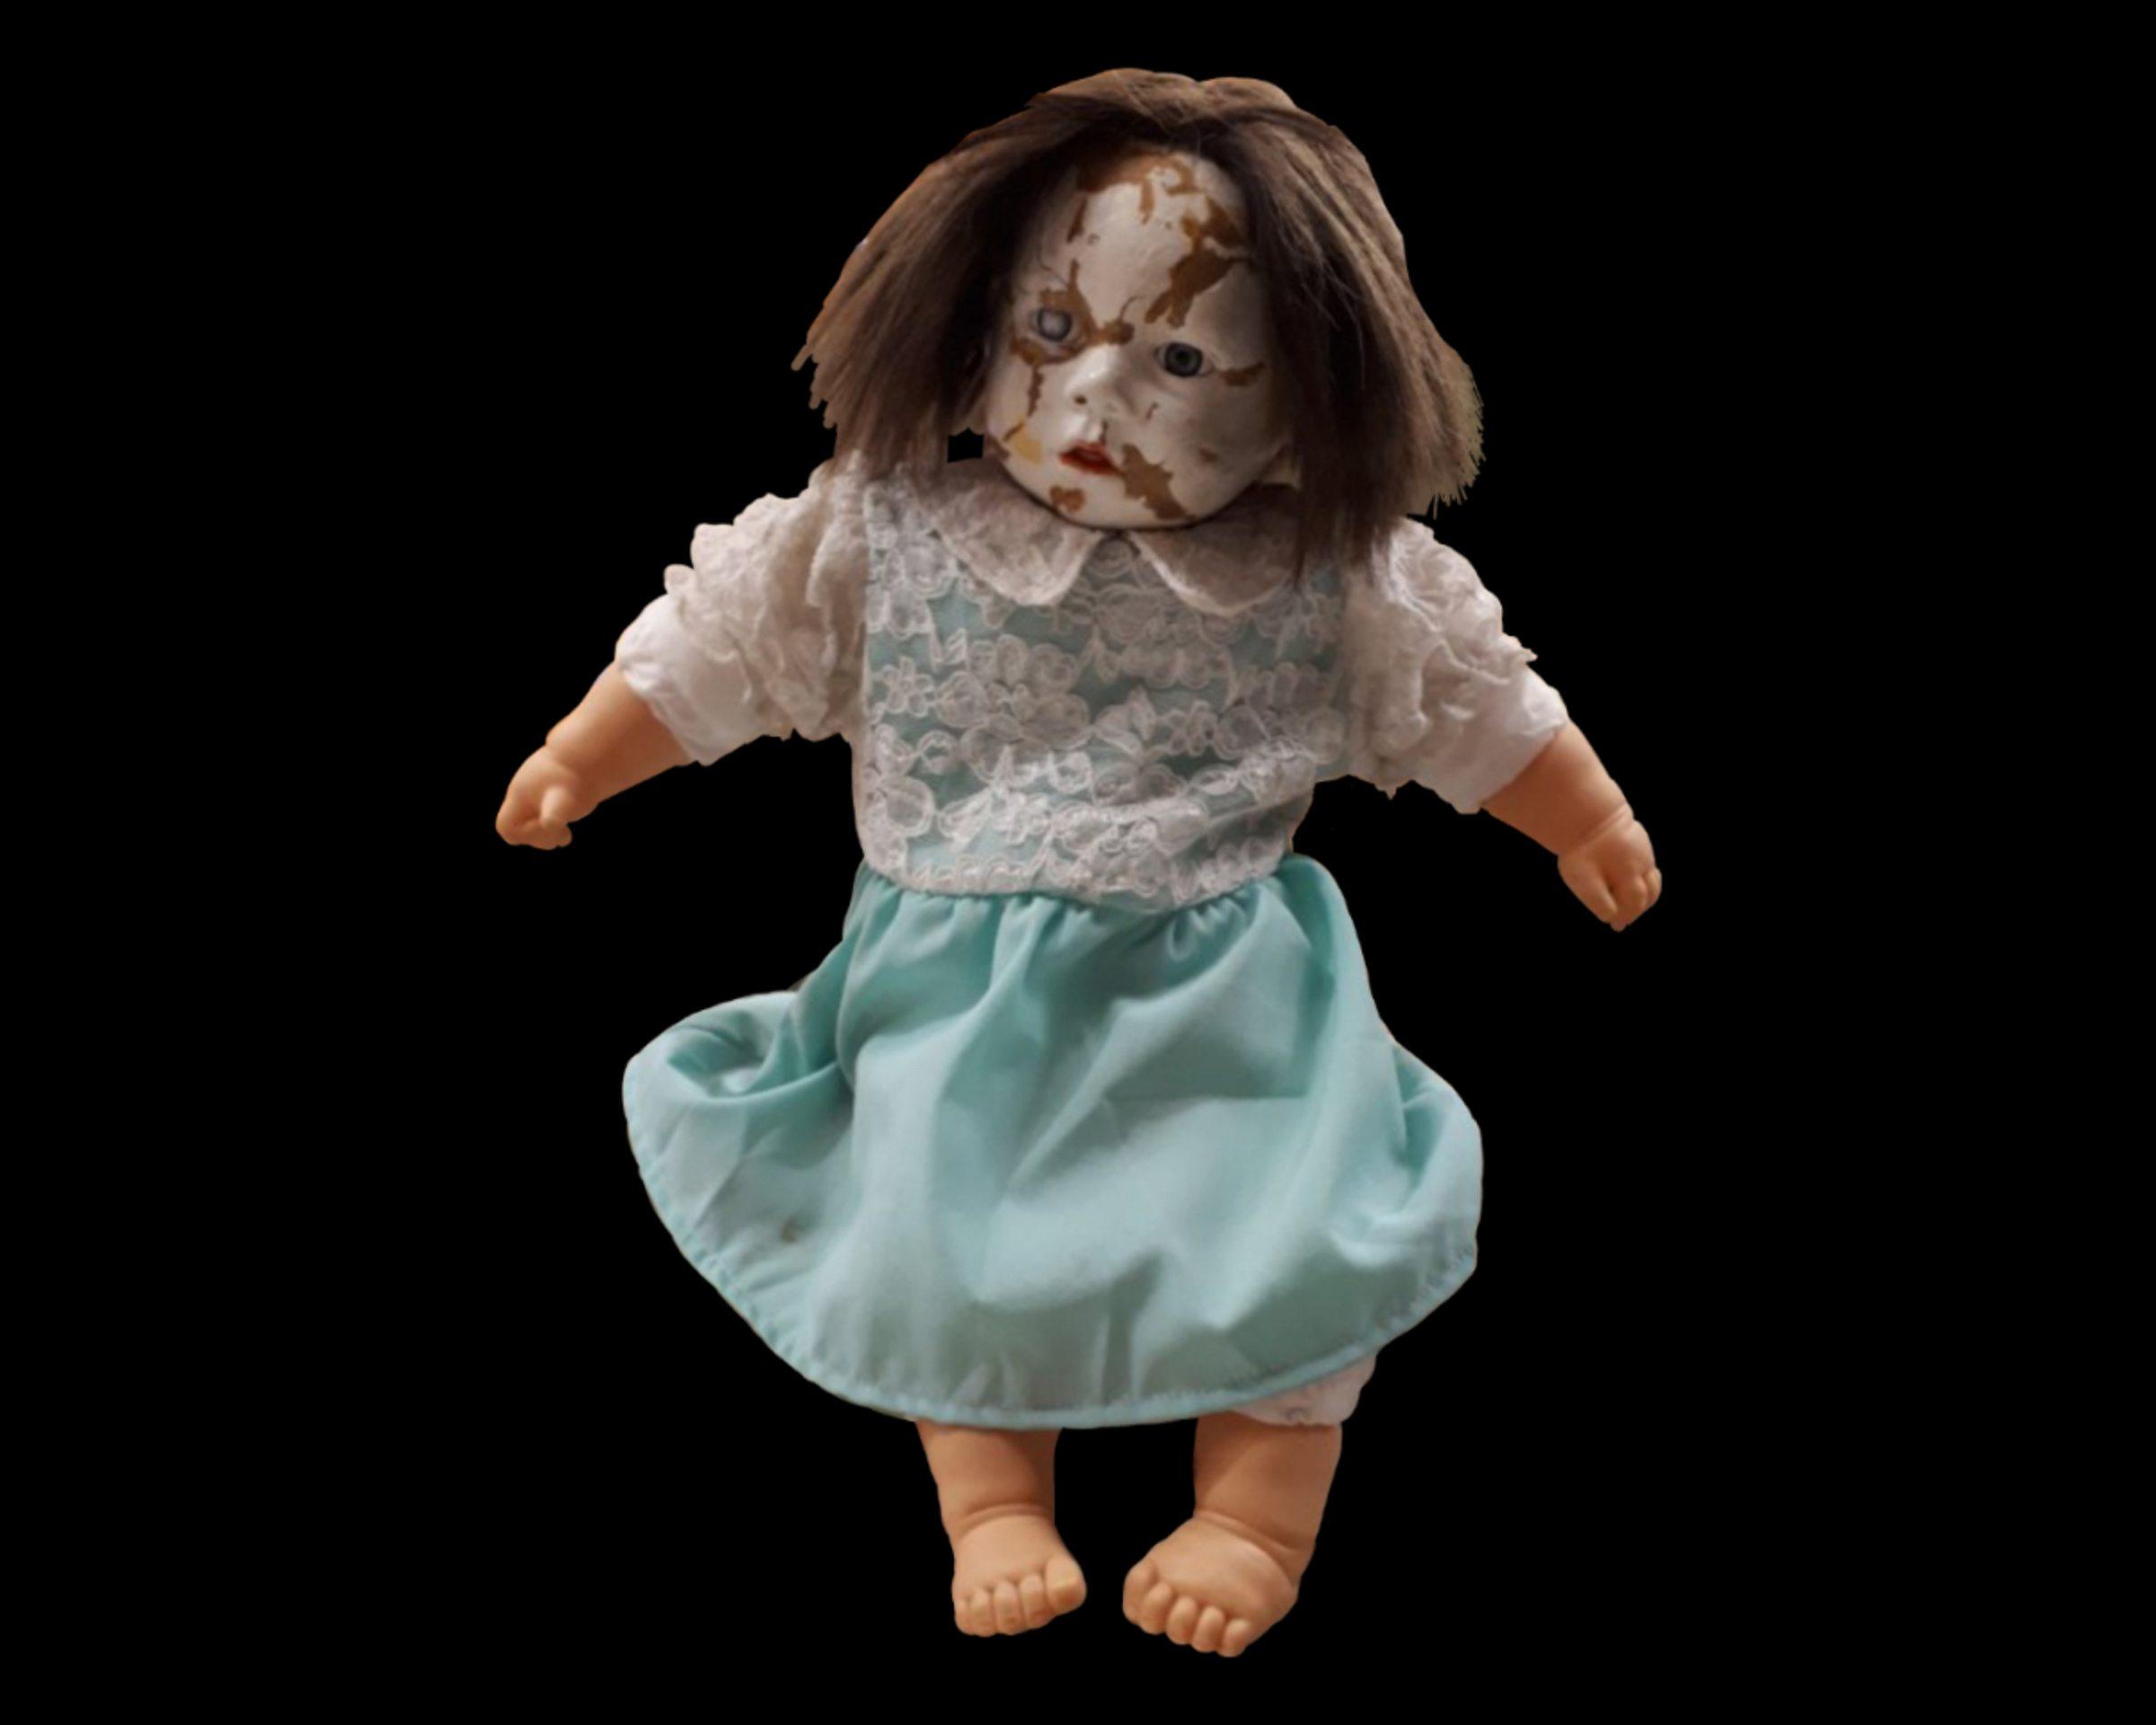 Katza The Cursed Russian Doll